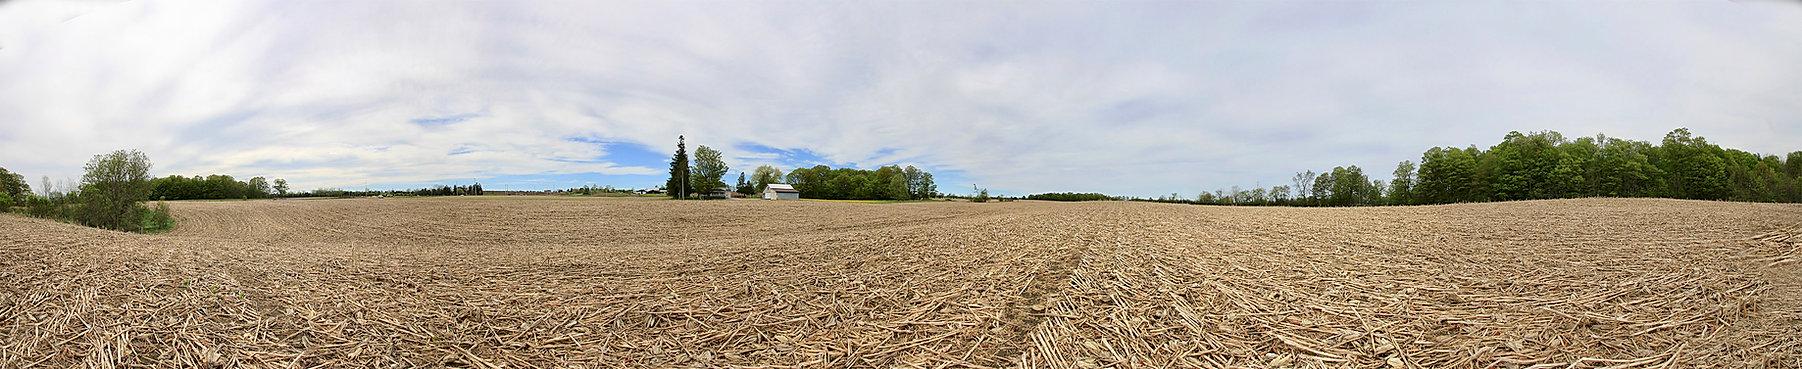 Farm corn field - for sale